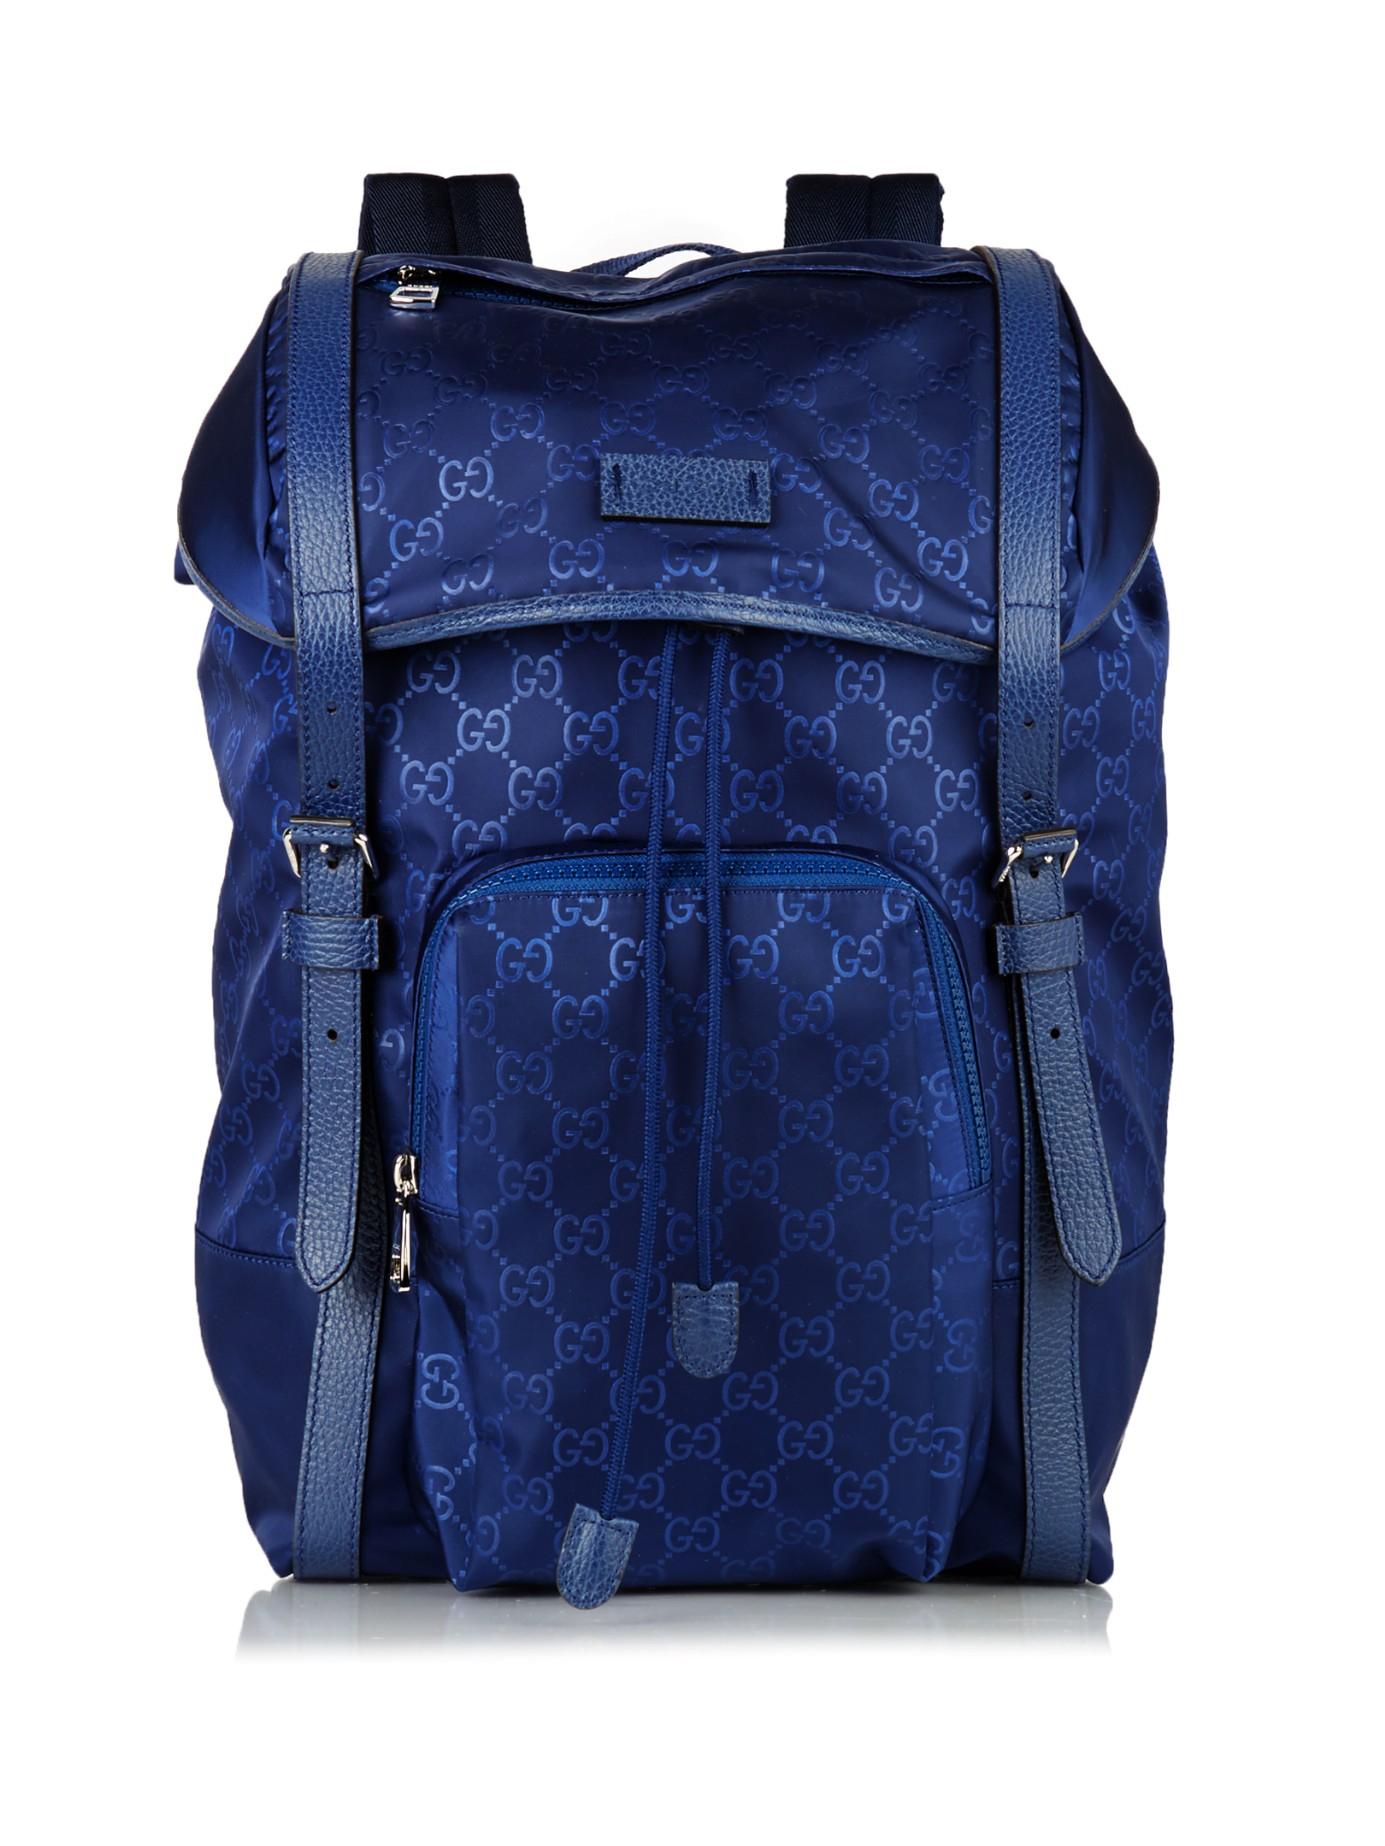 Lyst Gucci Gg Debossed Nylon Backpack In Blue For Men